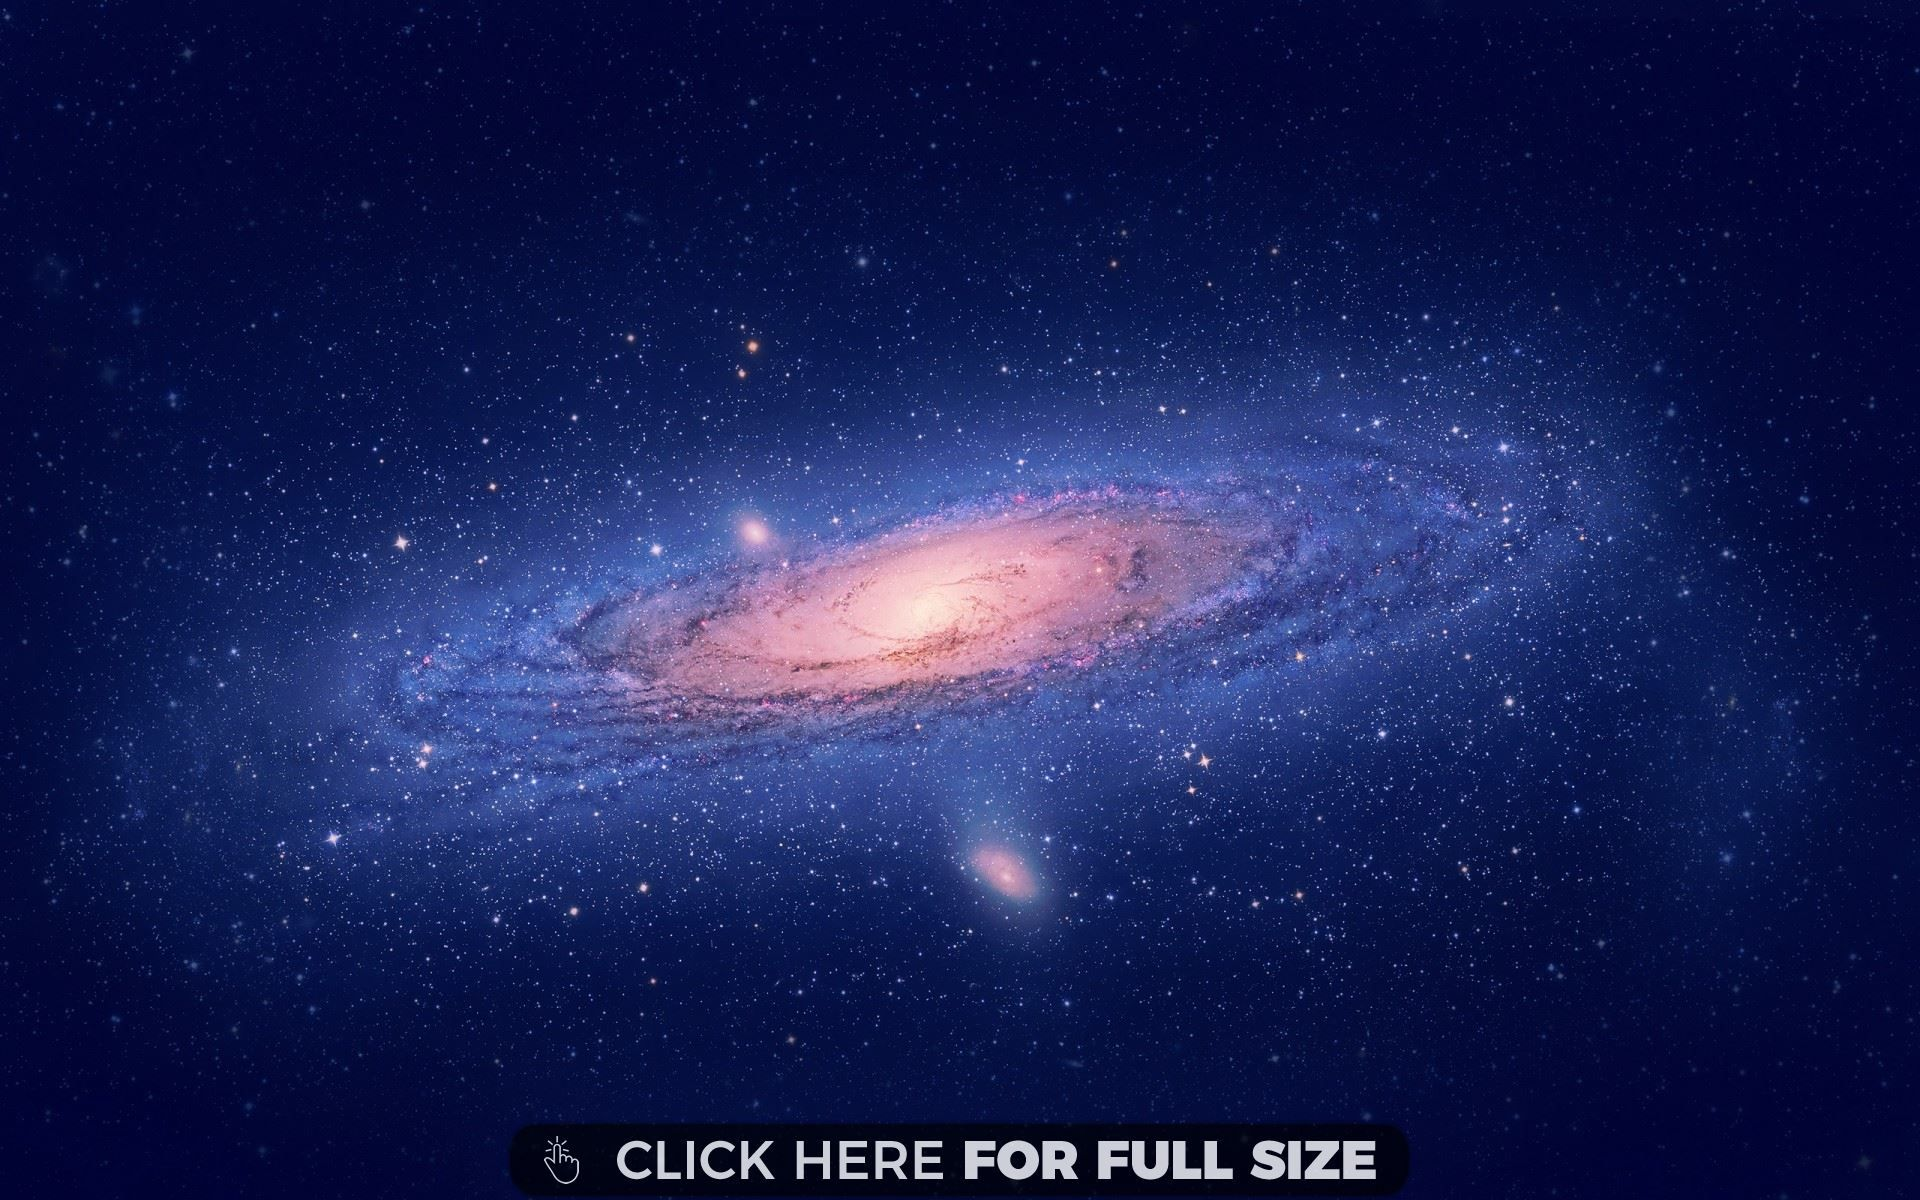 Andromeda Galaxy 4125 Apple Galaxy Wallpaper Galaxy Wallpaper Hd Galaxy Wallpaper